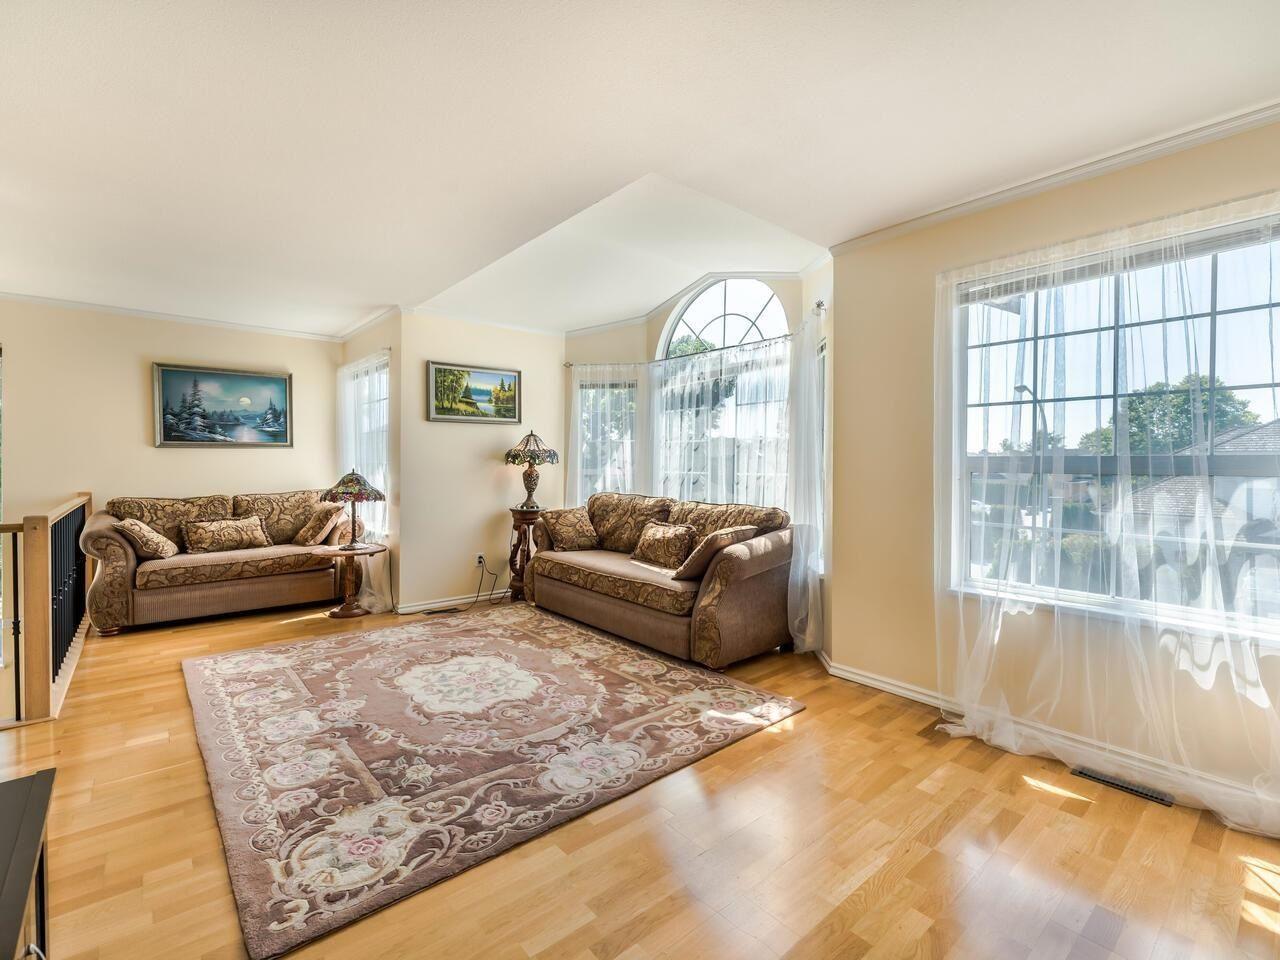 Photo 8: Photos: 5602 WILSON Court in Richmond: Hamilton RI House for sale : MLS®# R2602420